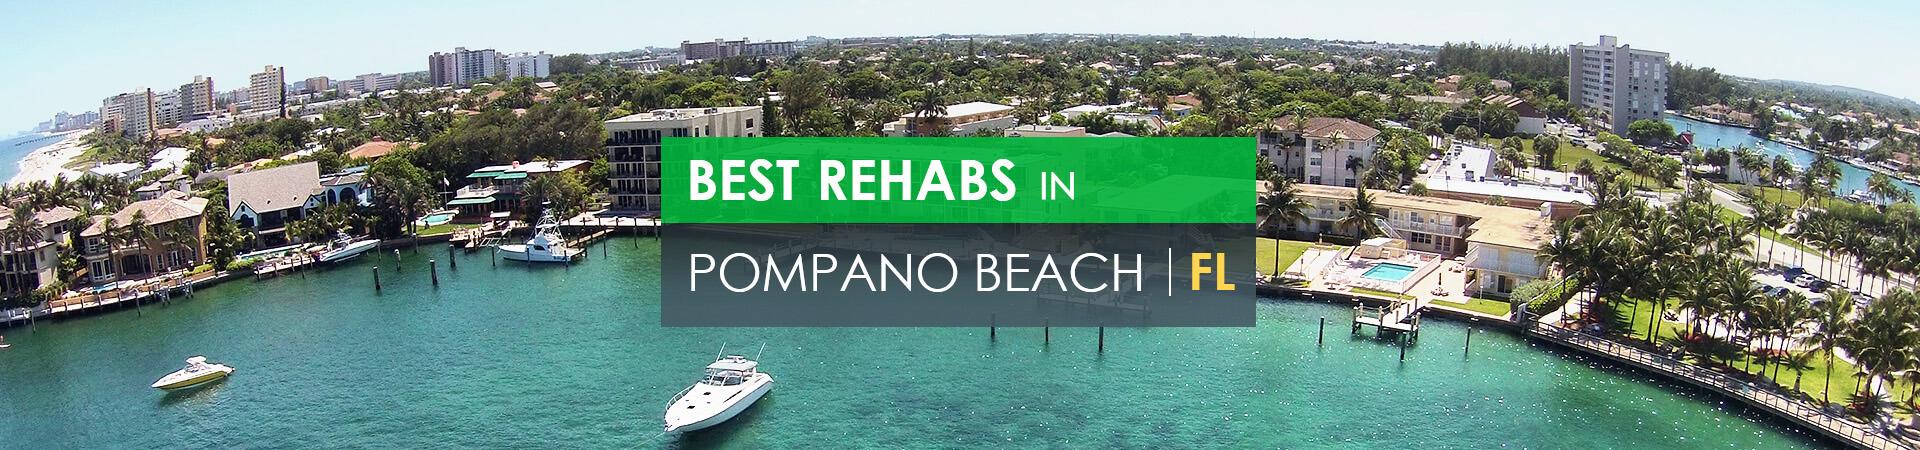 Best rehabs in Pompano Beach, FL